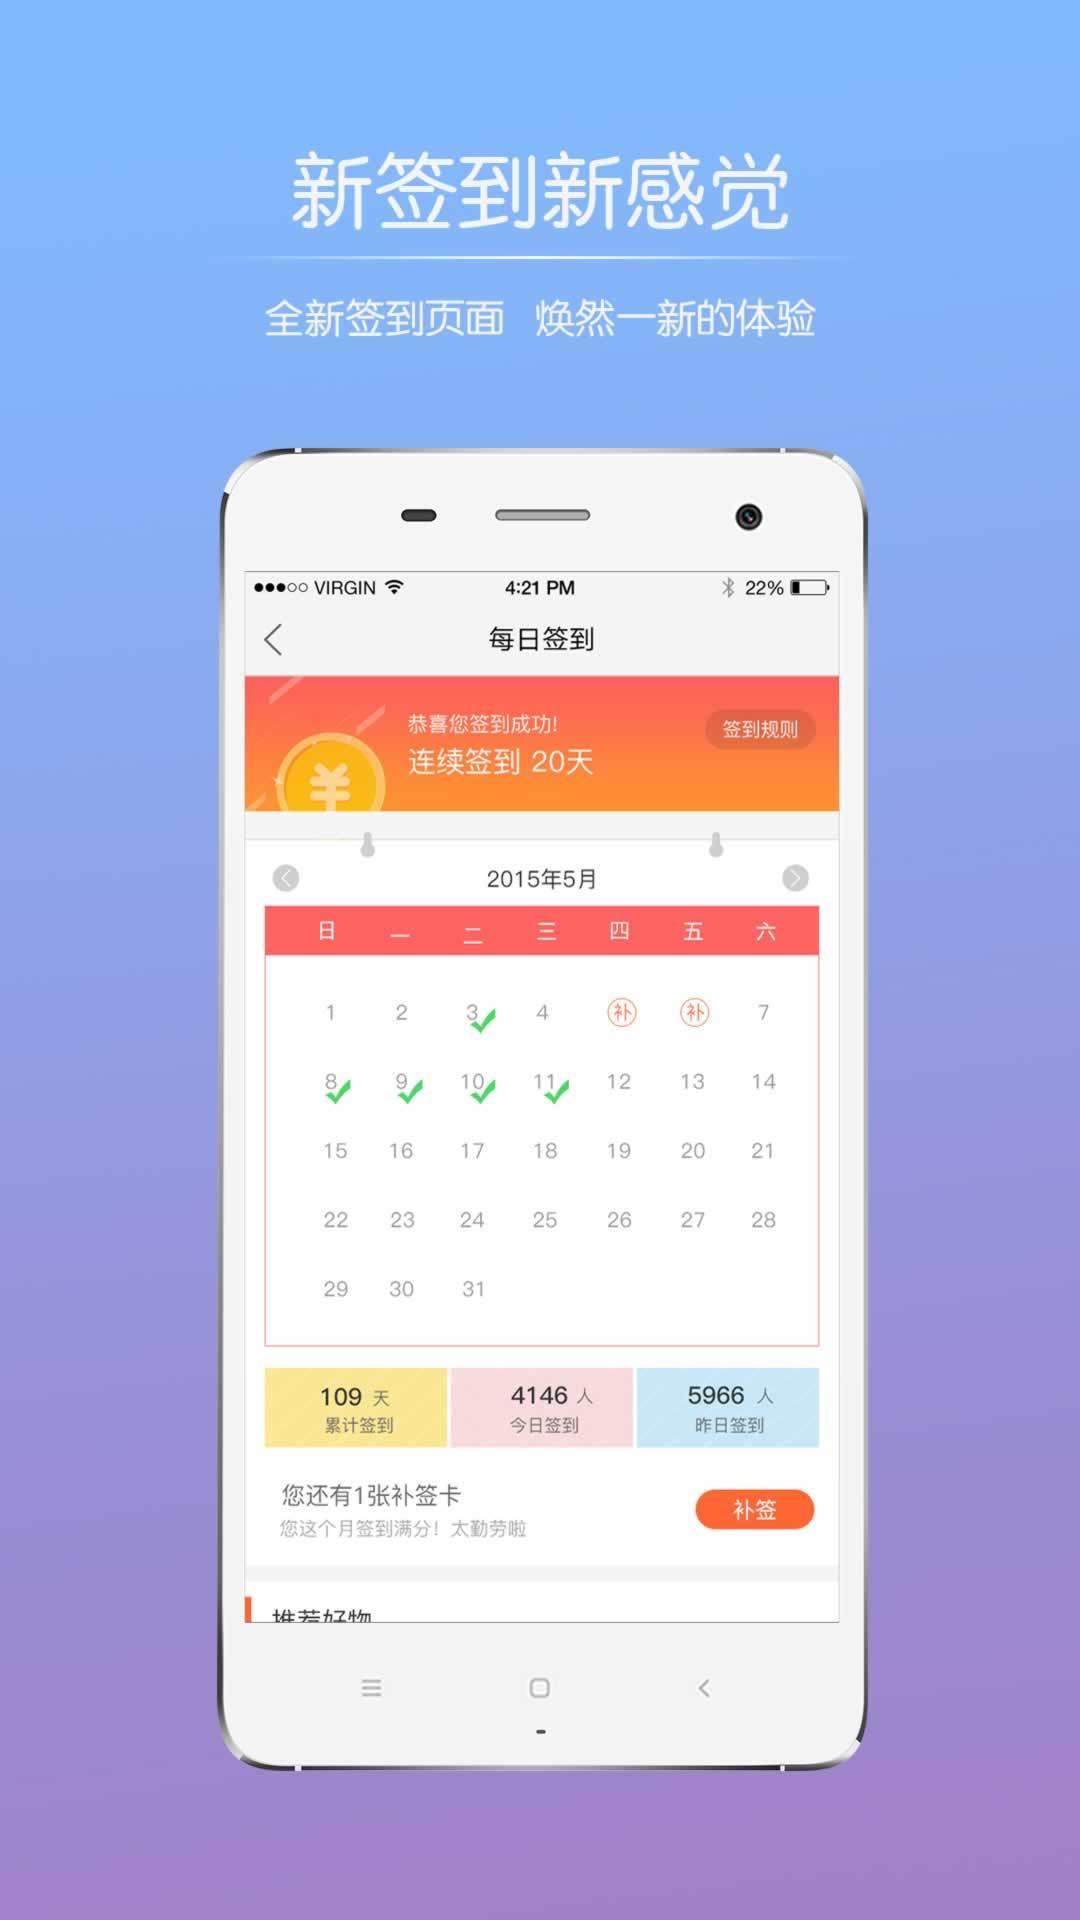 莱芜圈app